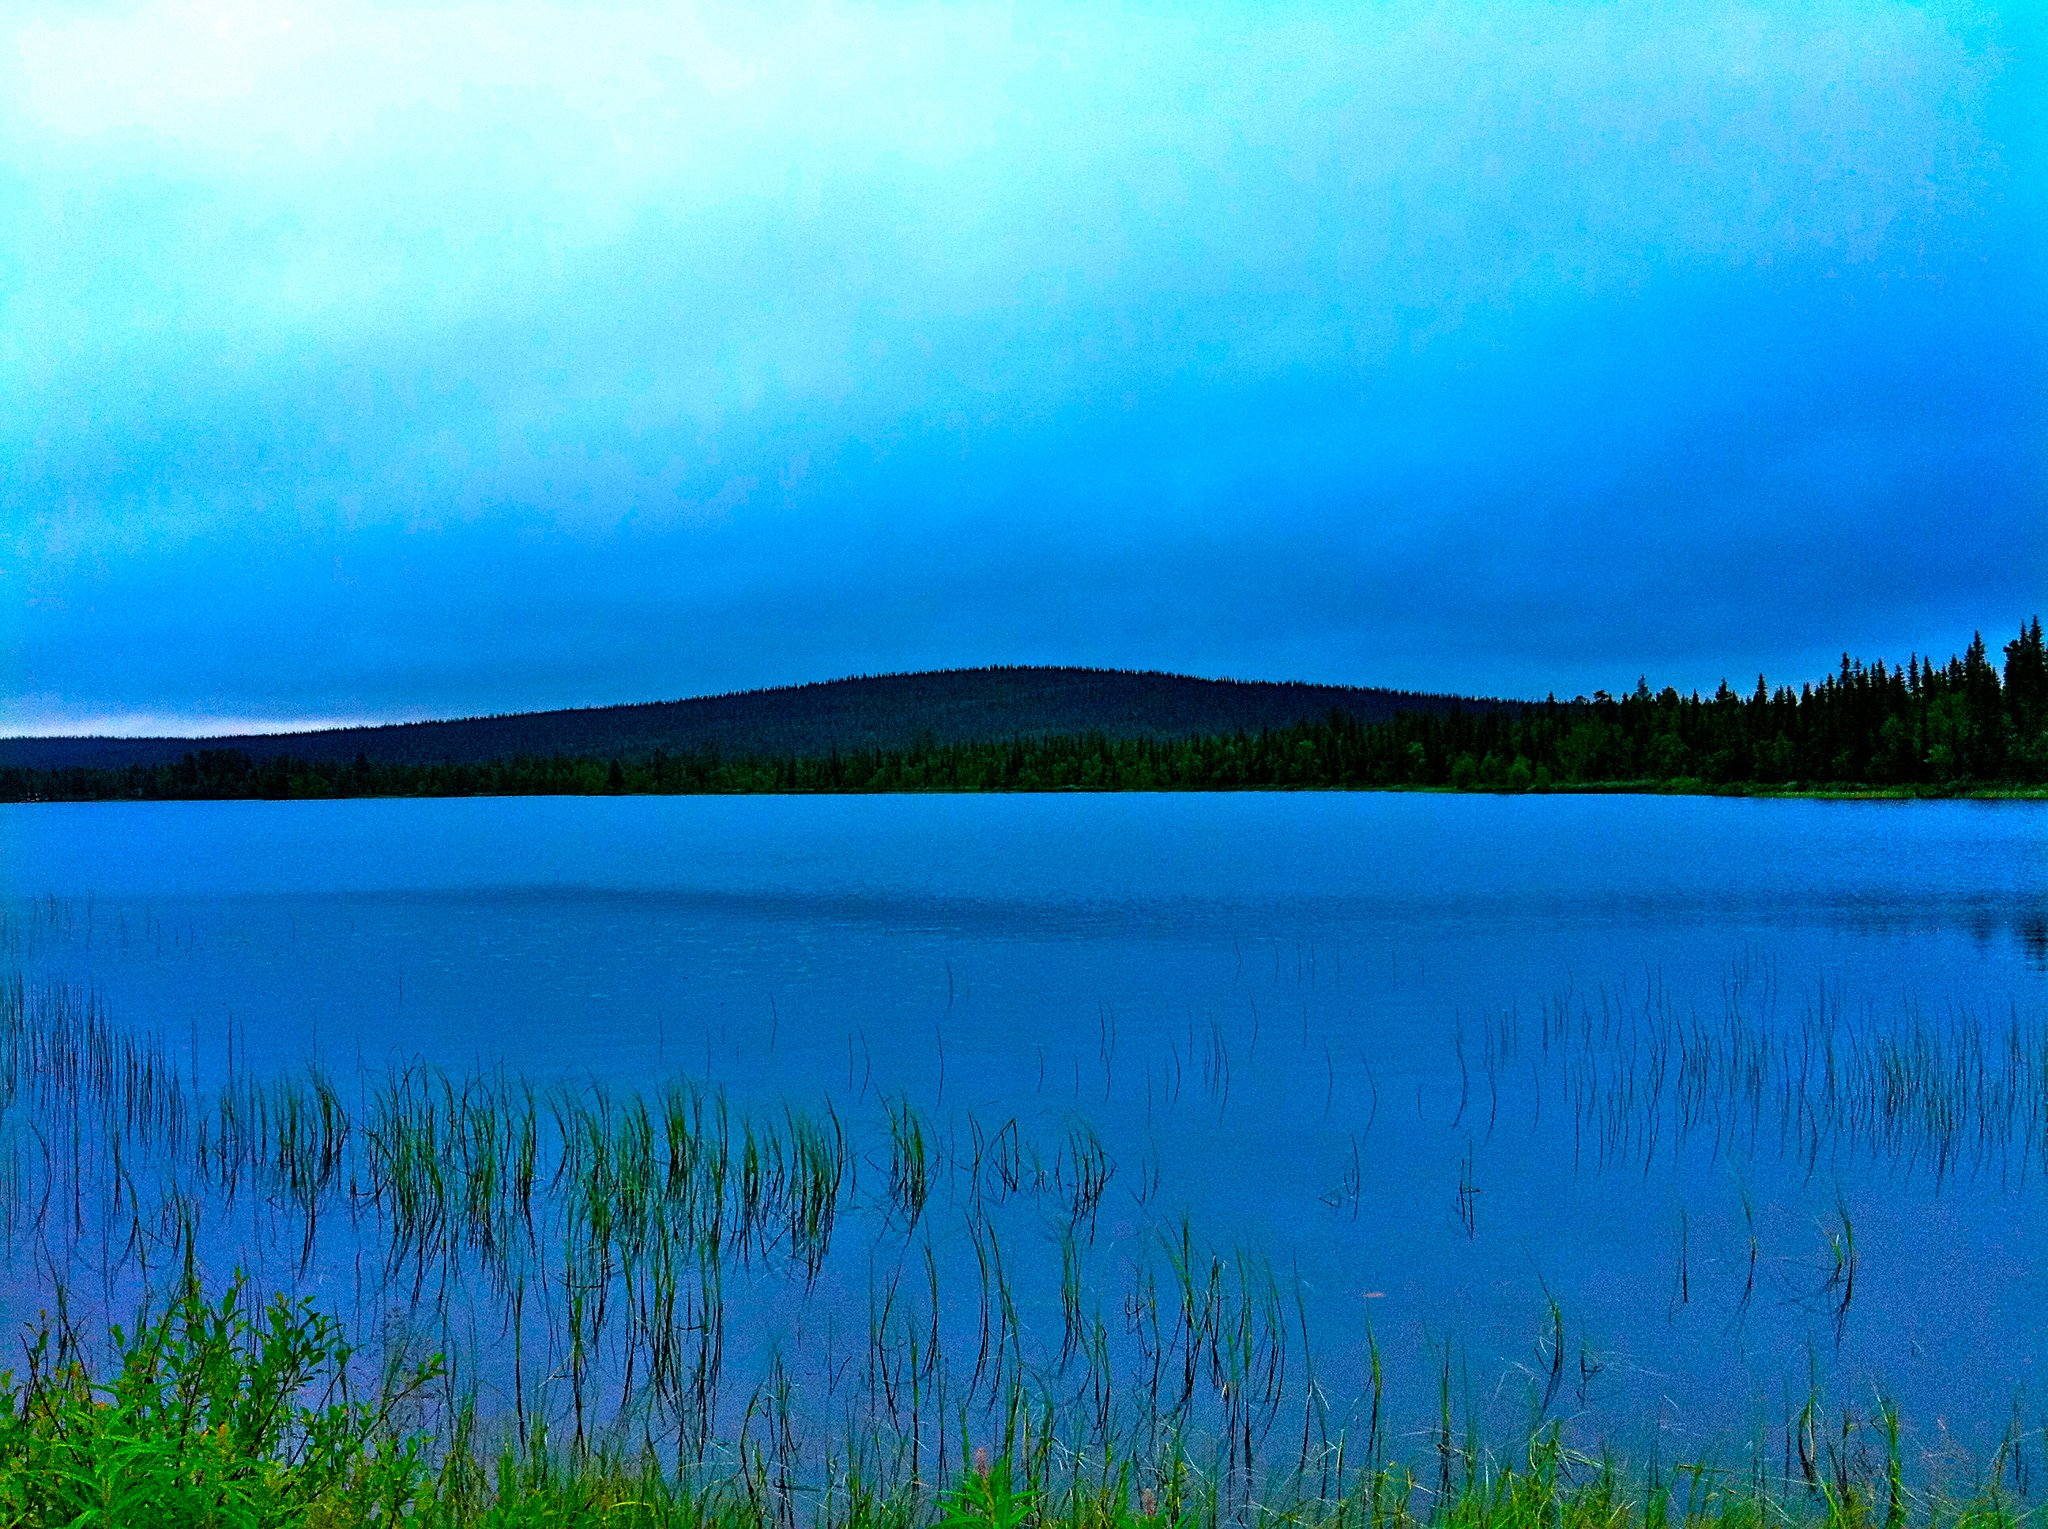 Blue Laponia, Sweden